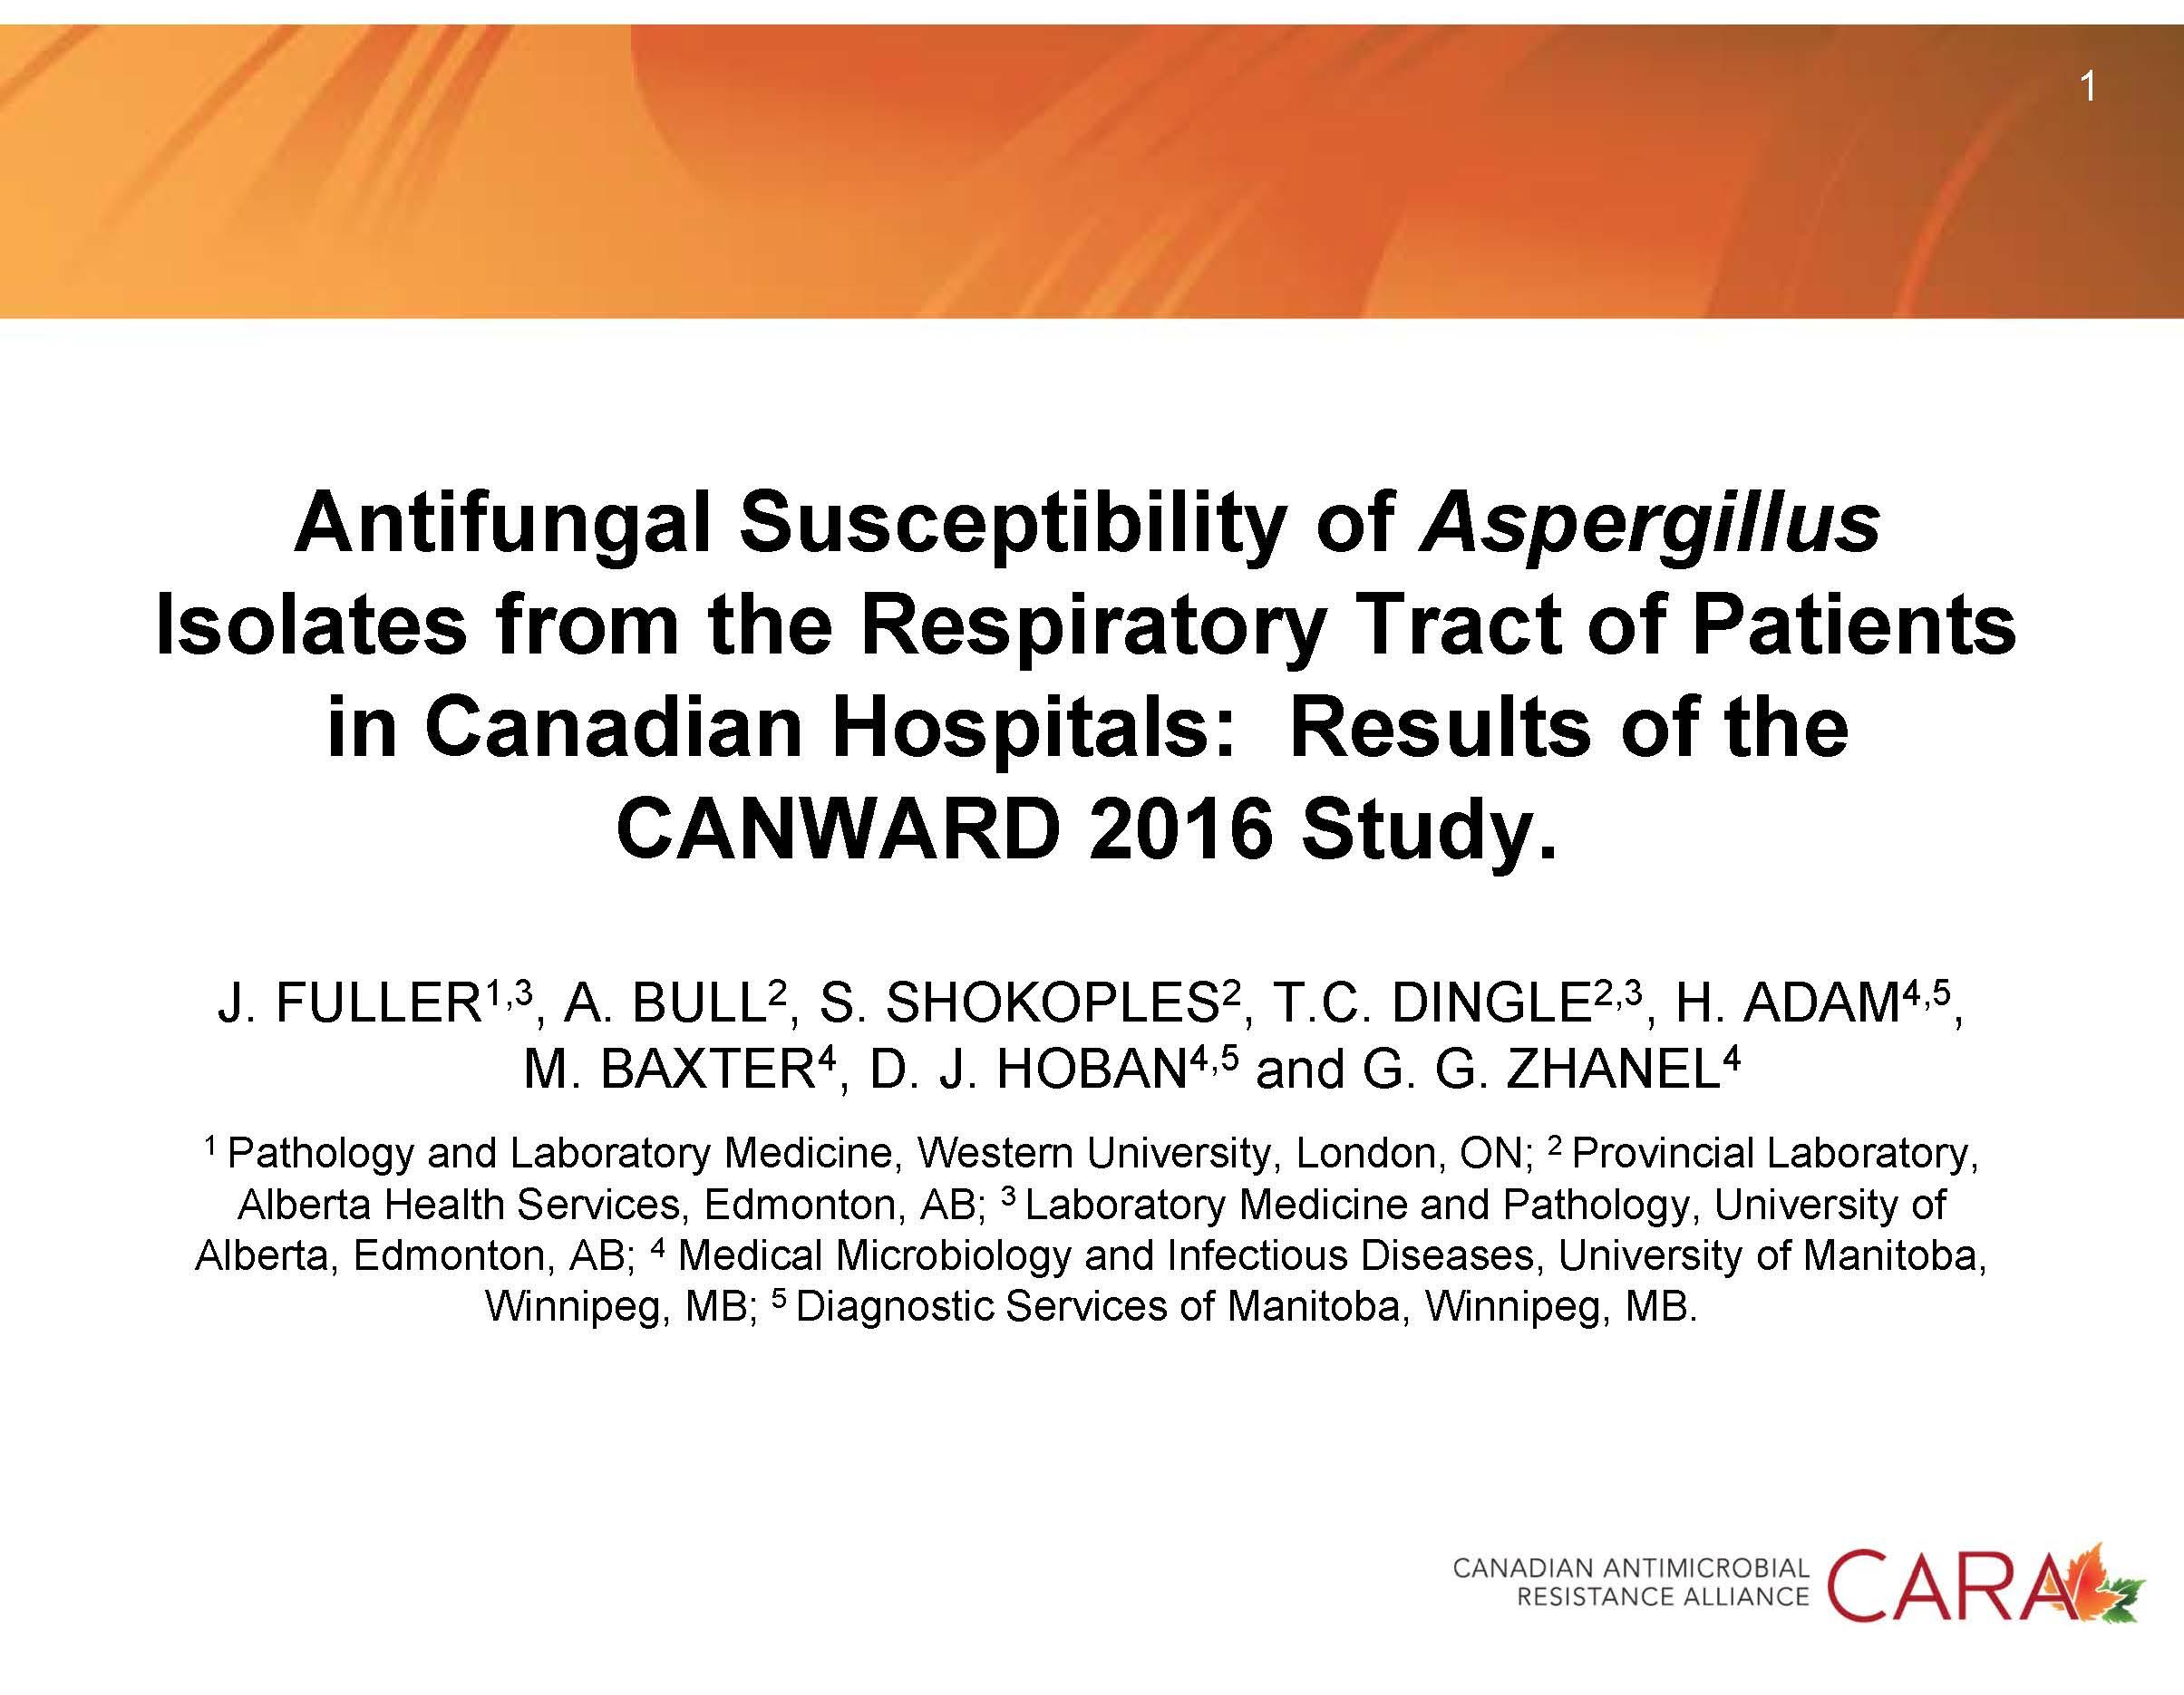 CANWARD Aspergillus 2016